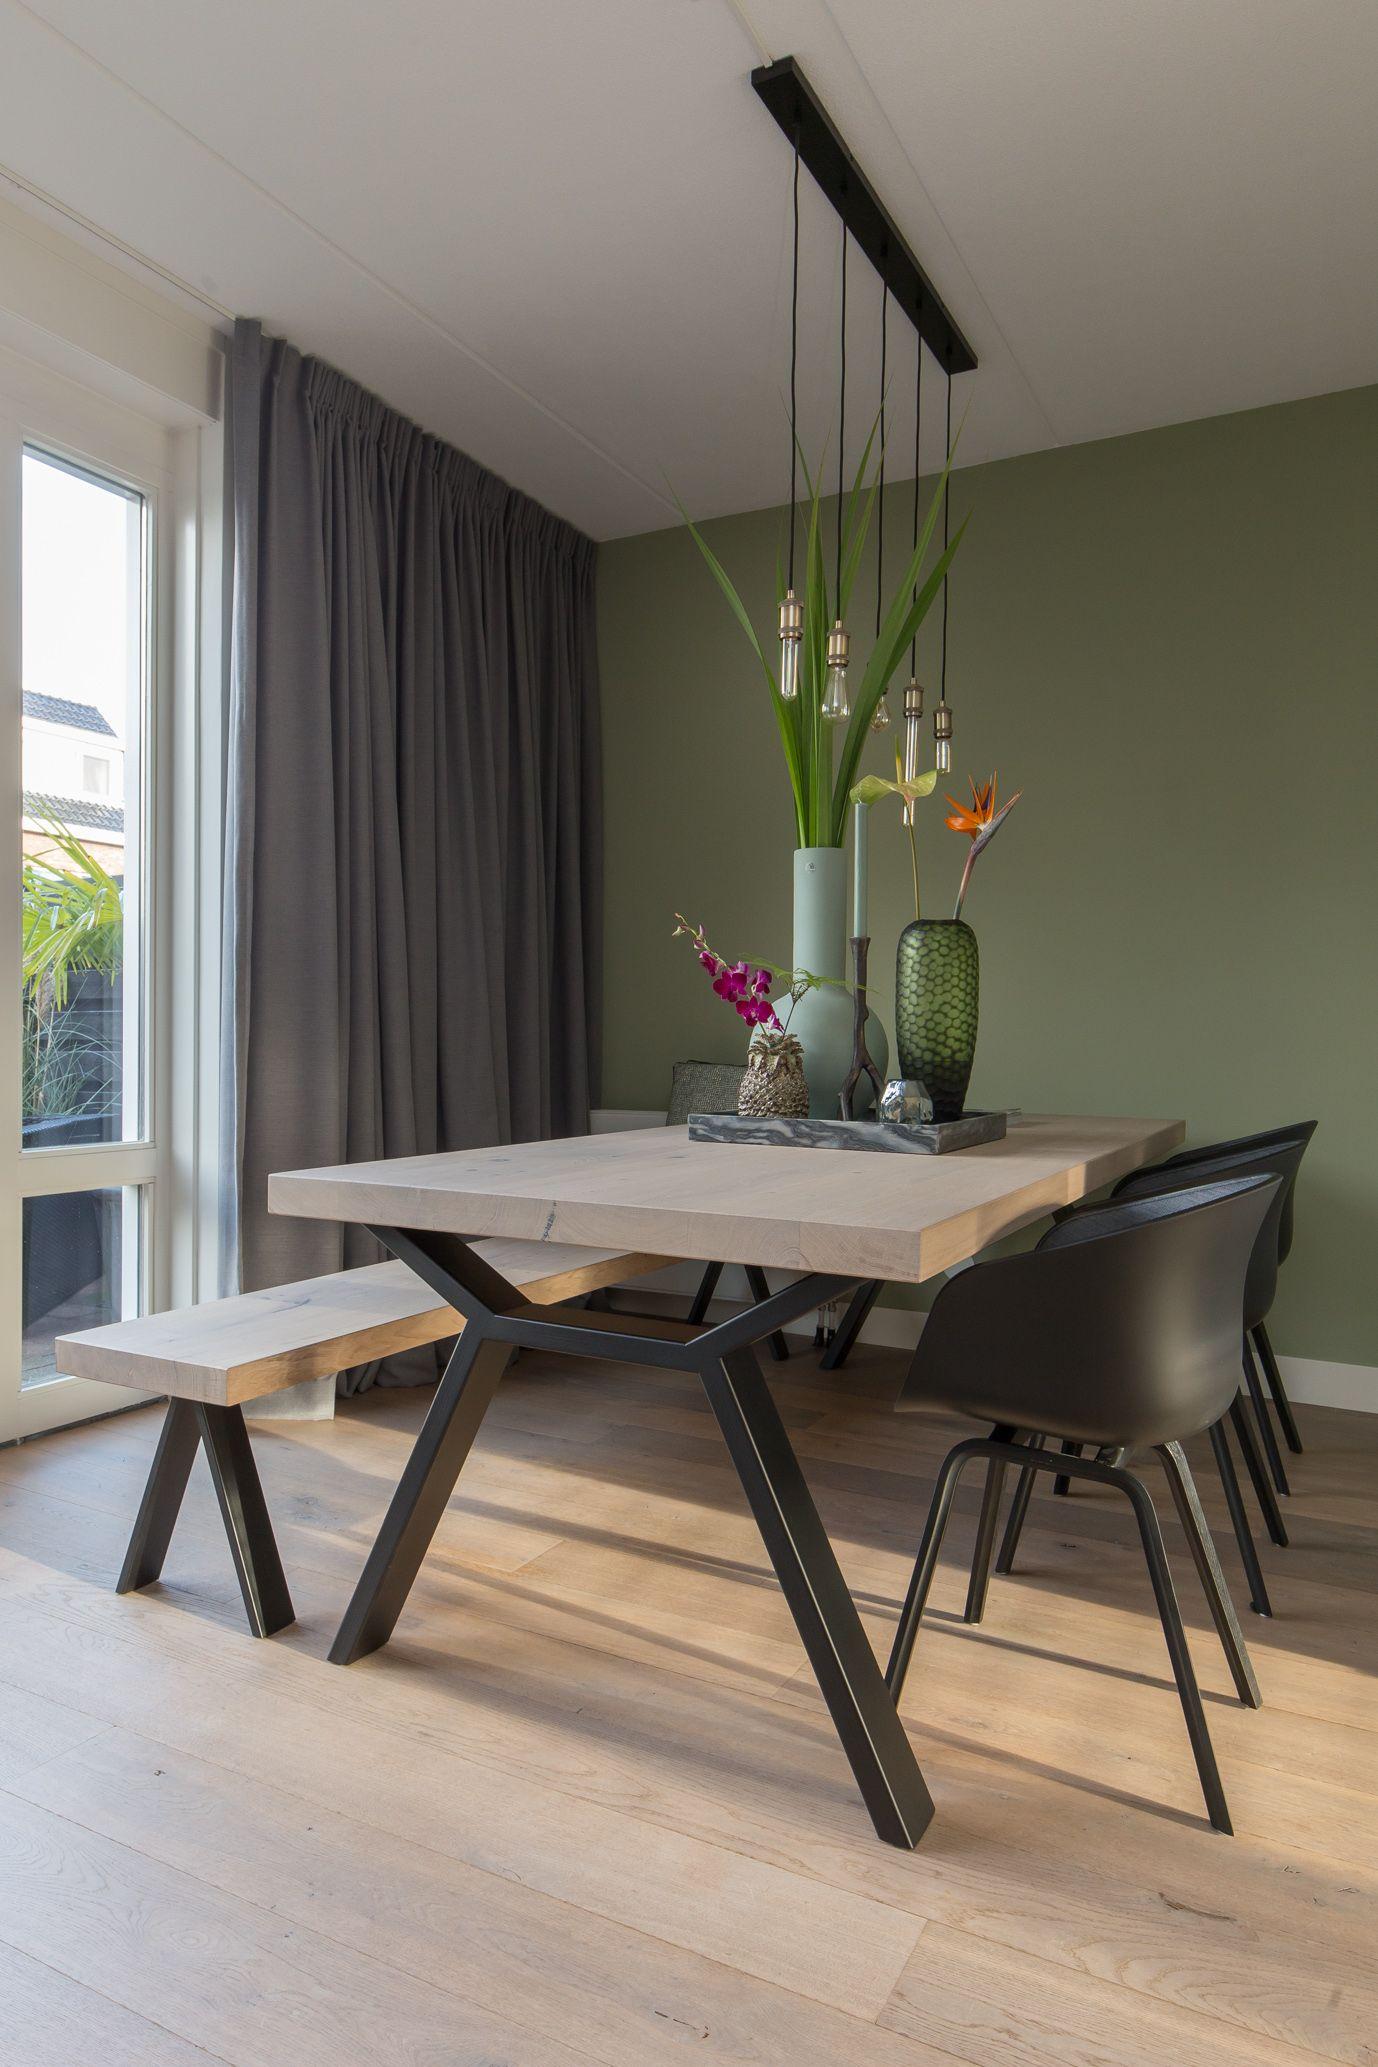 Schitterende Eetkamer Tafel.Portfolio Interieur Table Dining Room En Dining